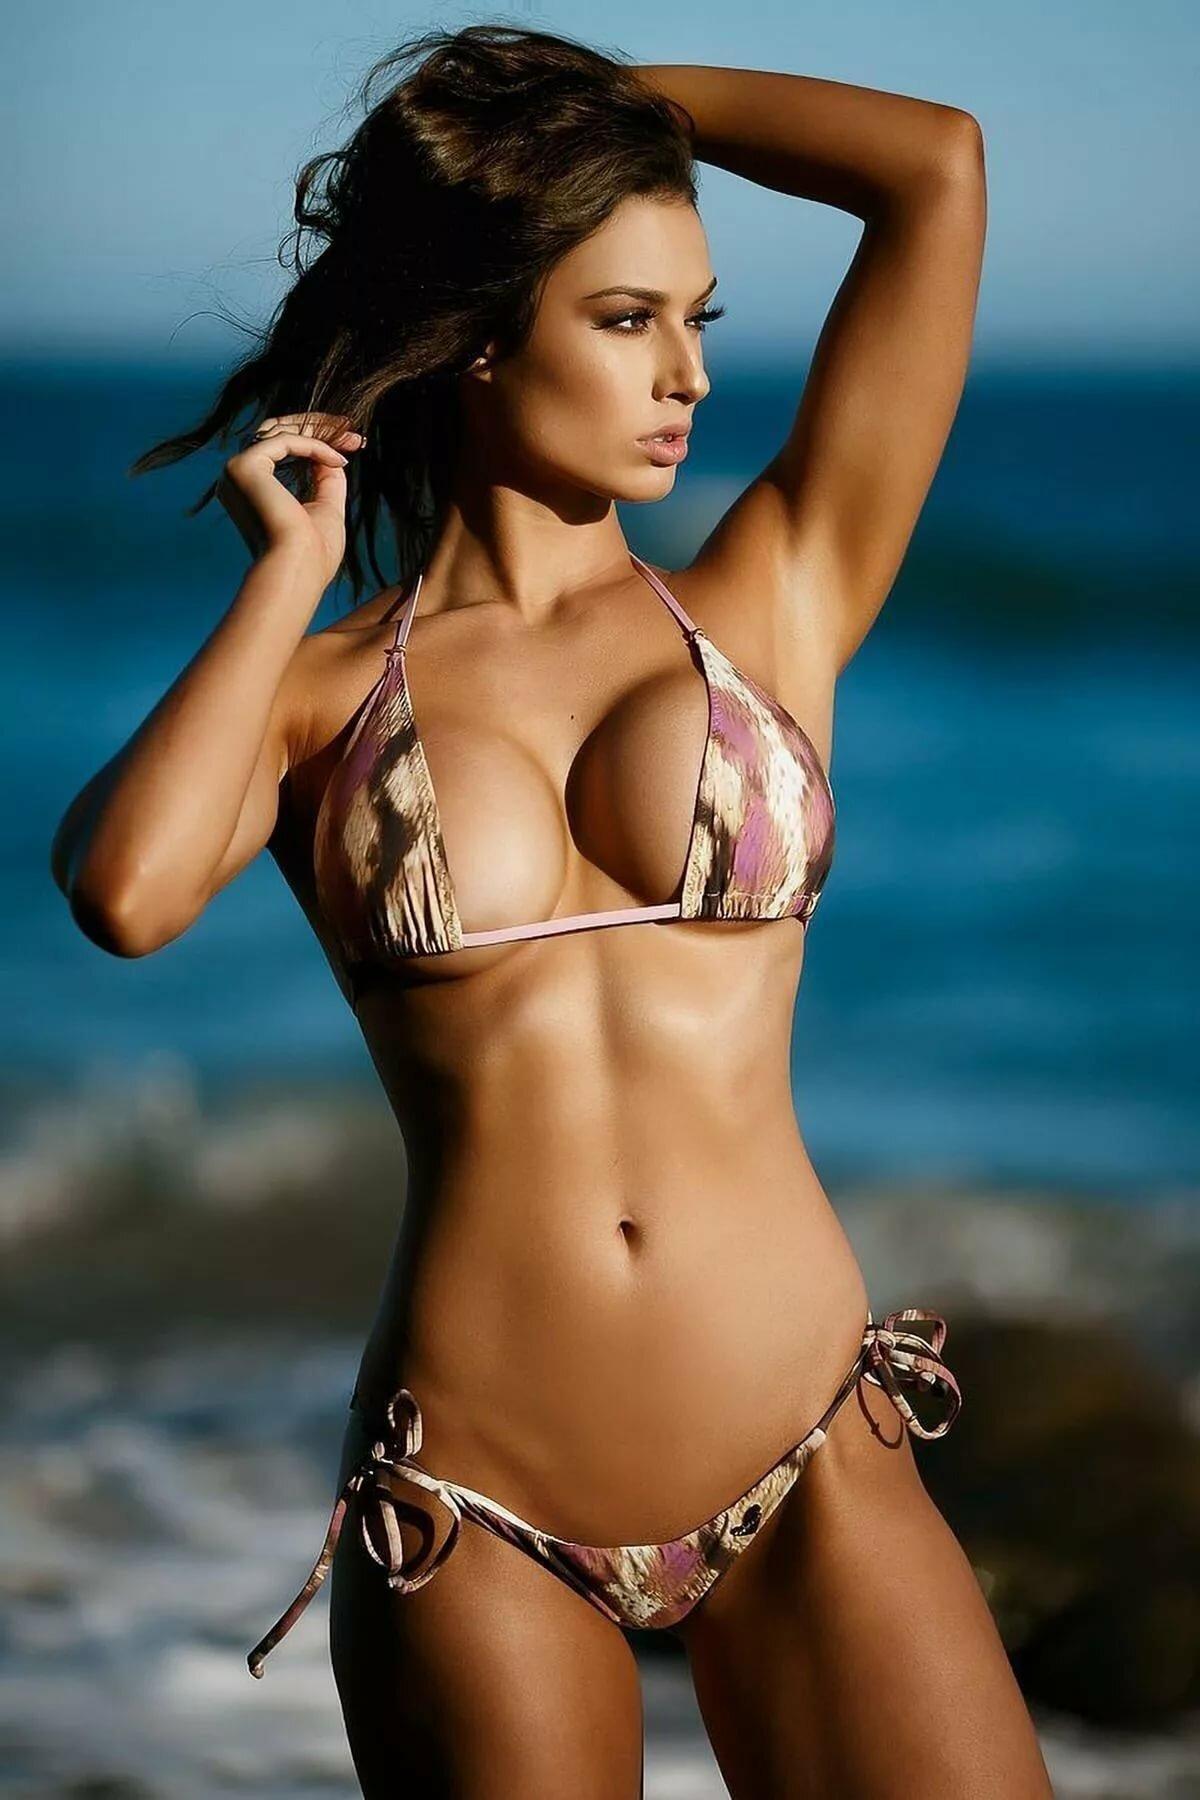 sexy-eyes-bikini-youngest-looking-ebony